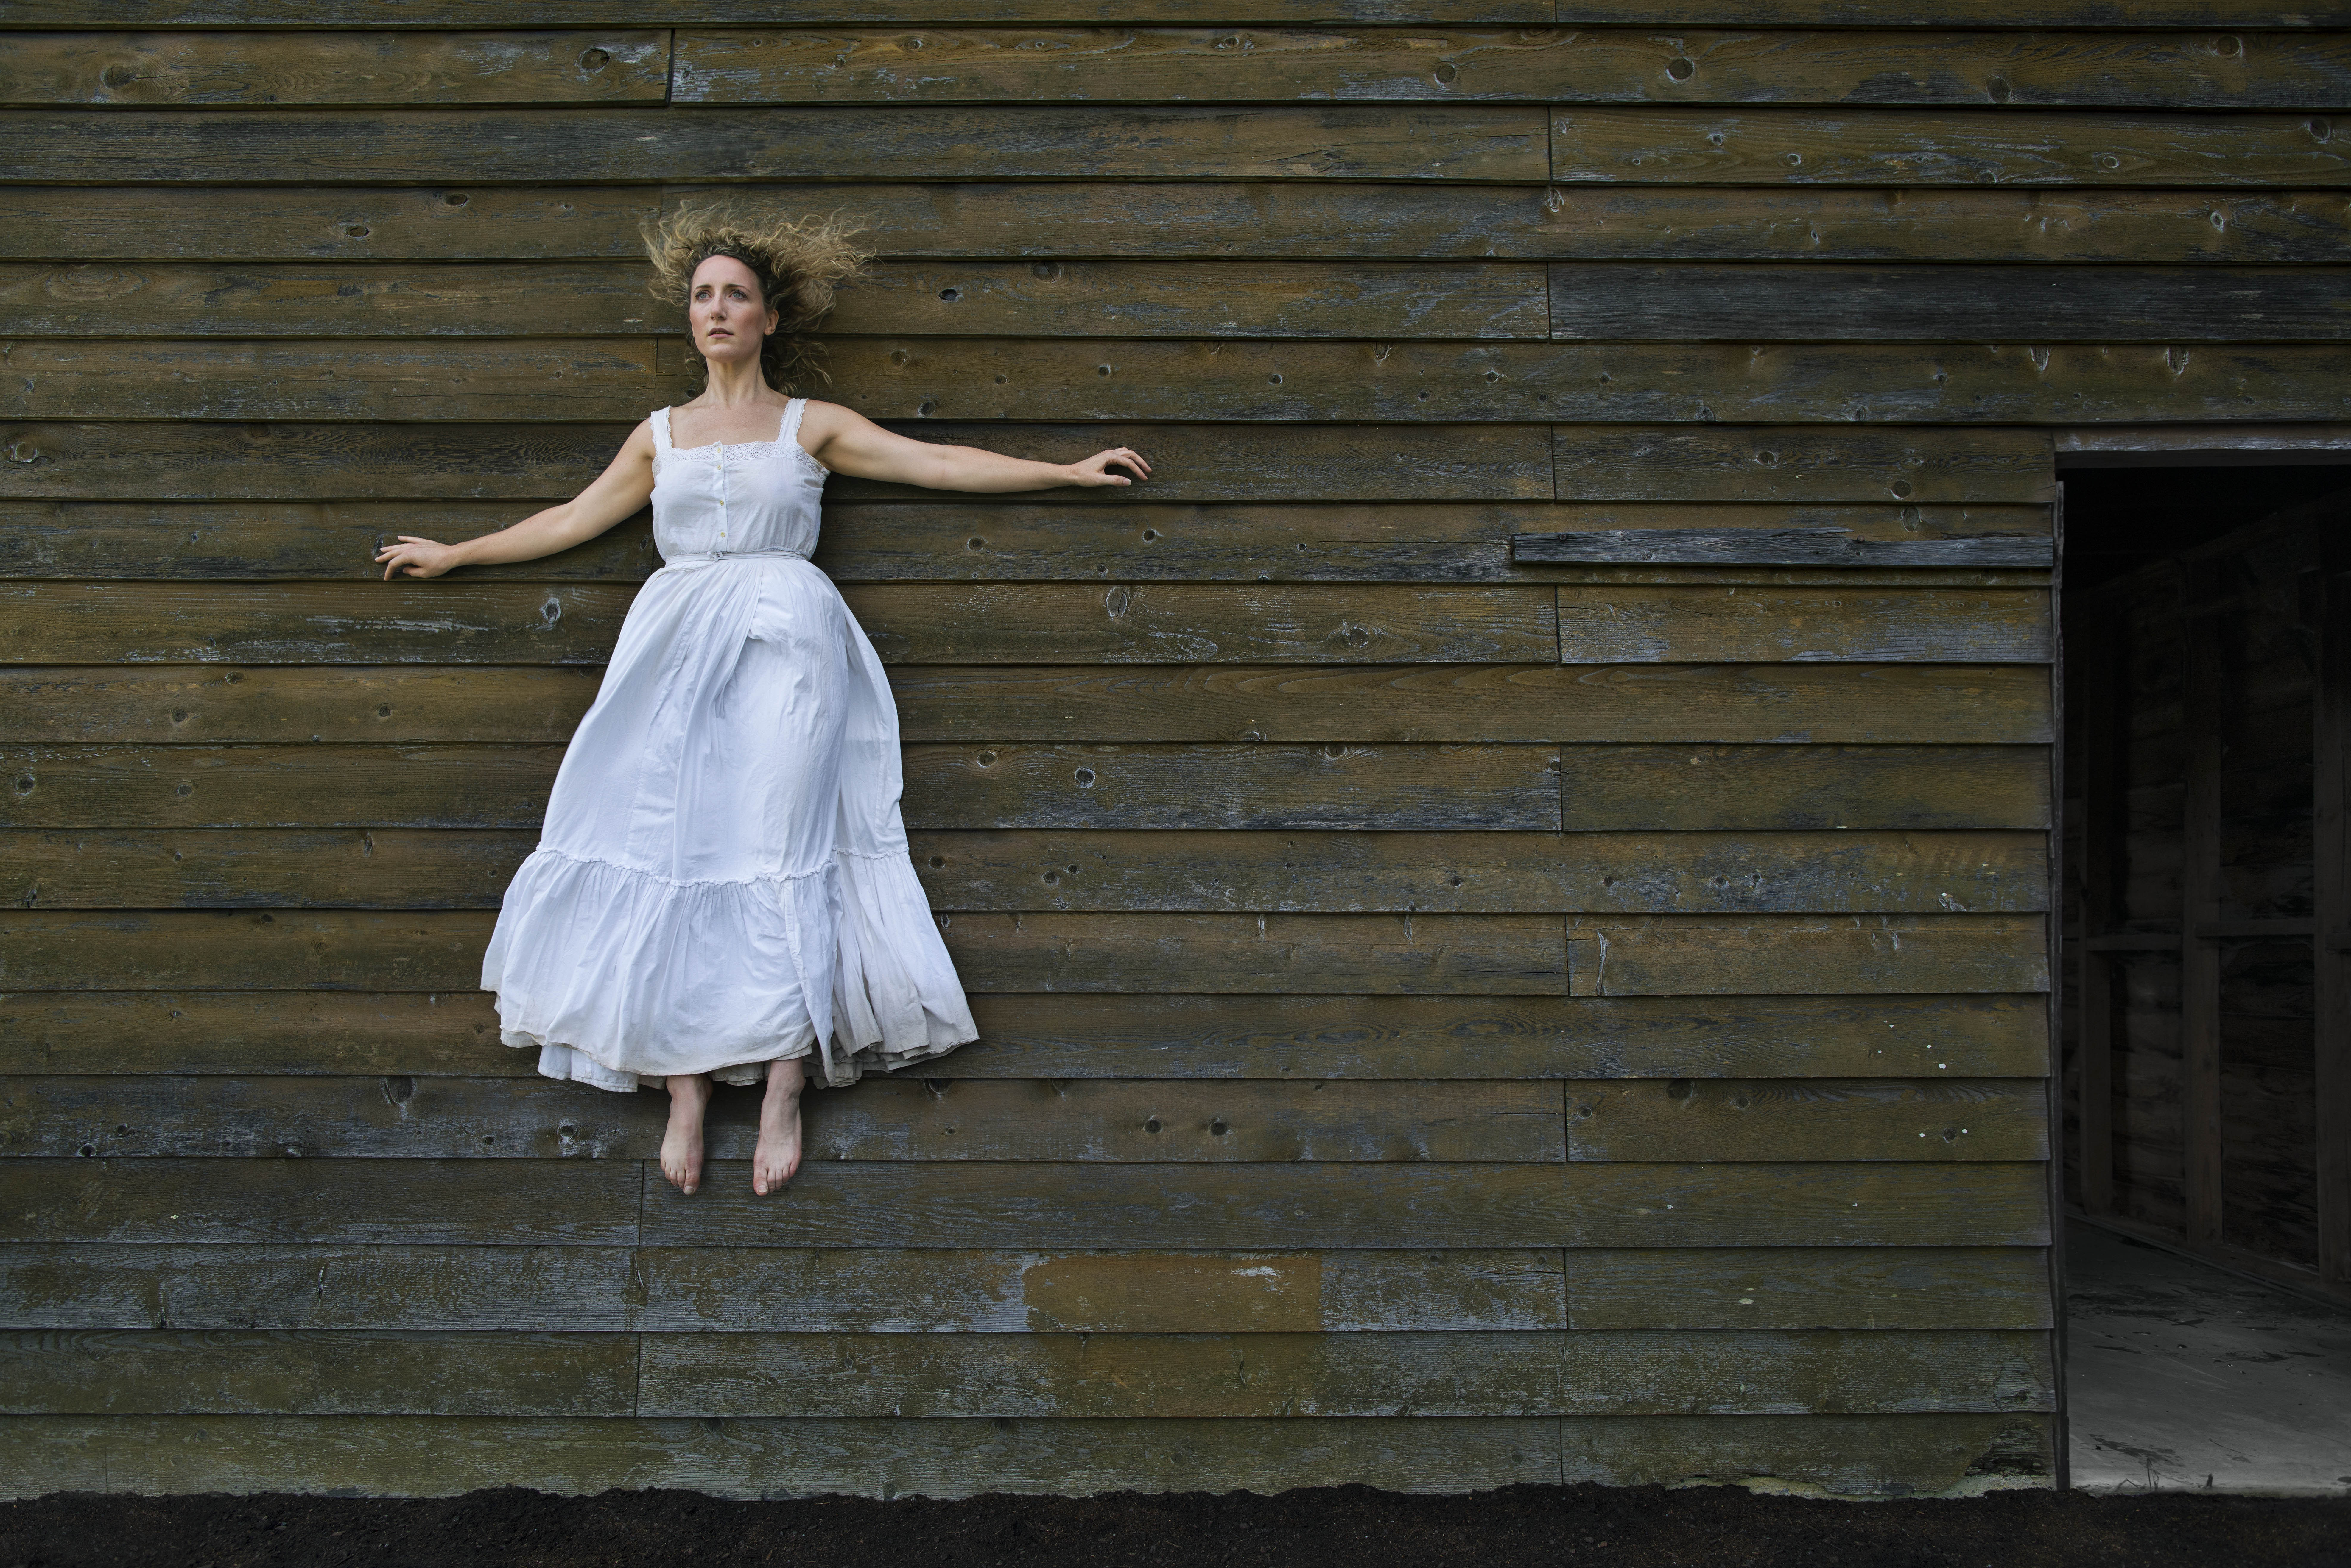 The Wall - Elise McCann